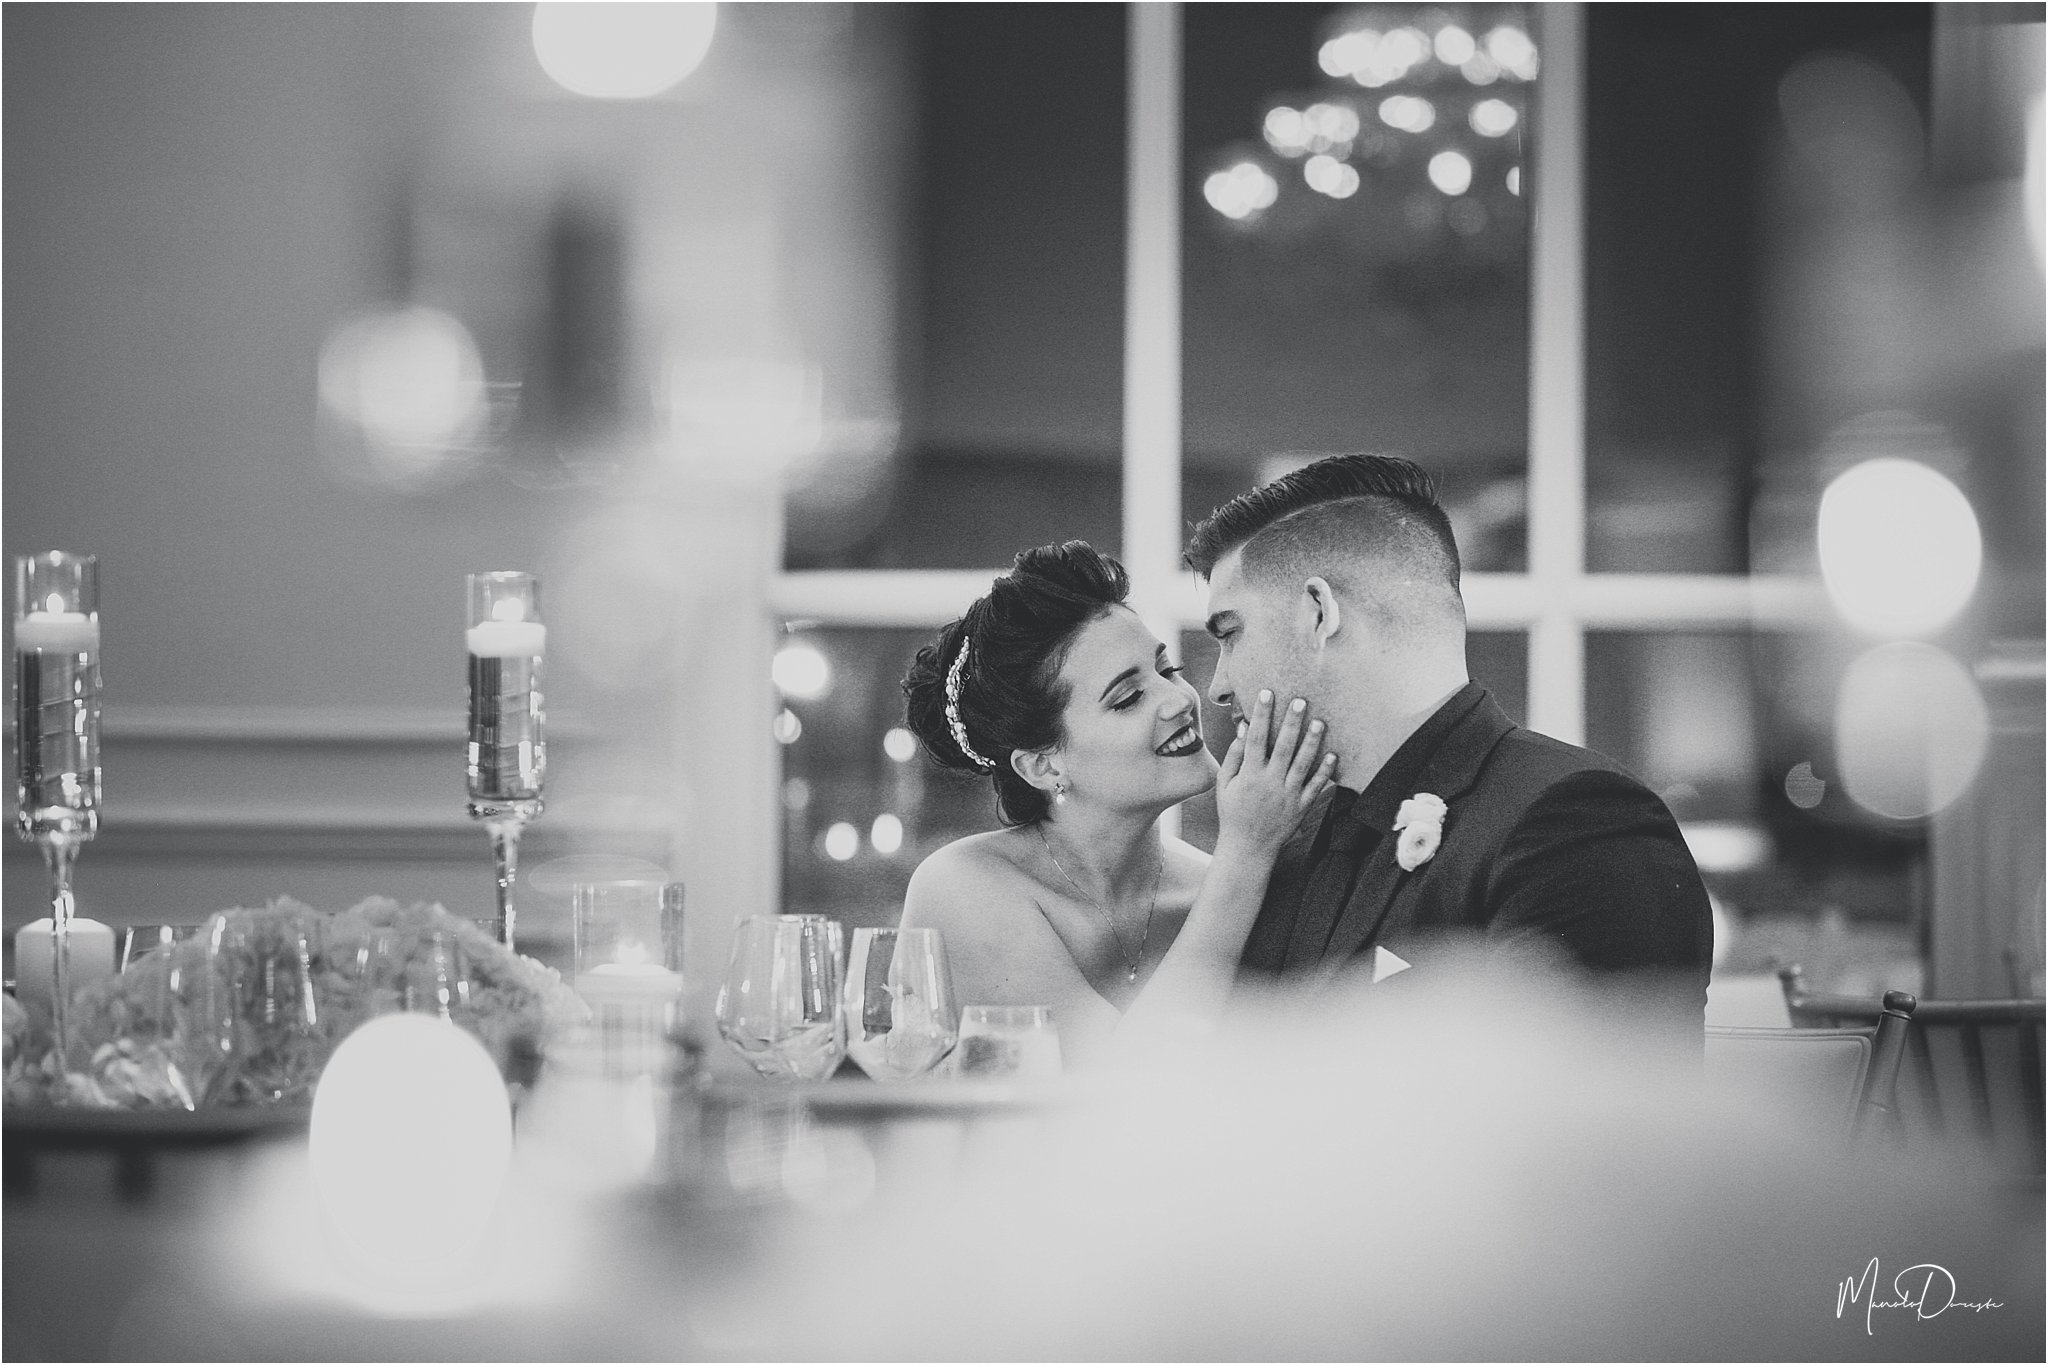 00968_ManoloDoreste_InFocusStudios_Wedding_Family_Photography_Miami_MiamiPhotographer.jpg